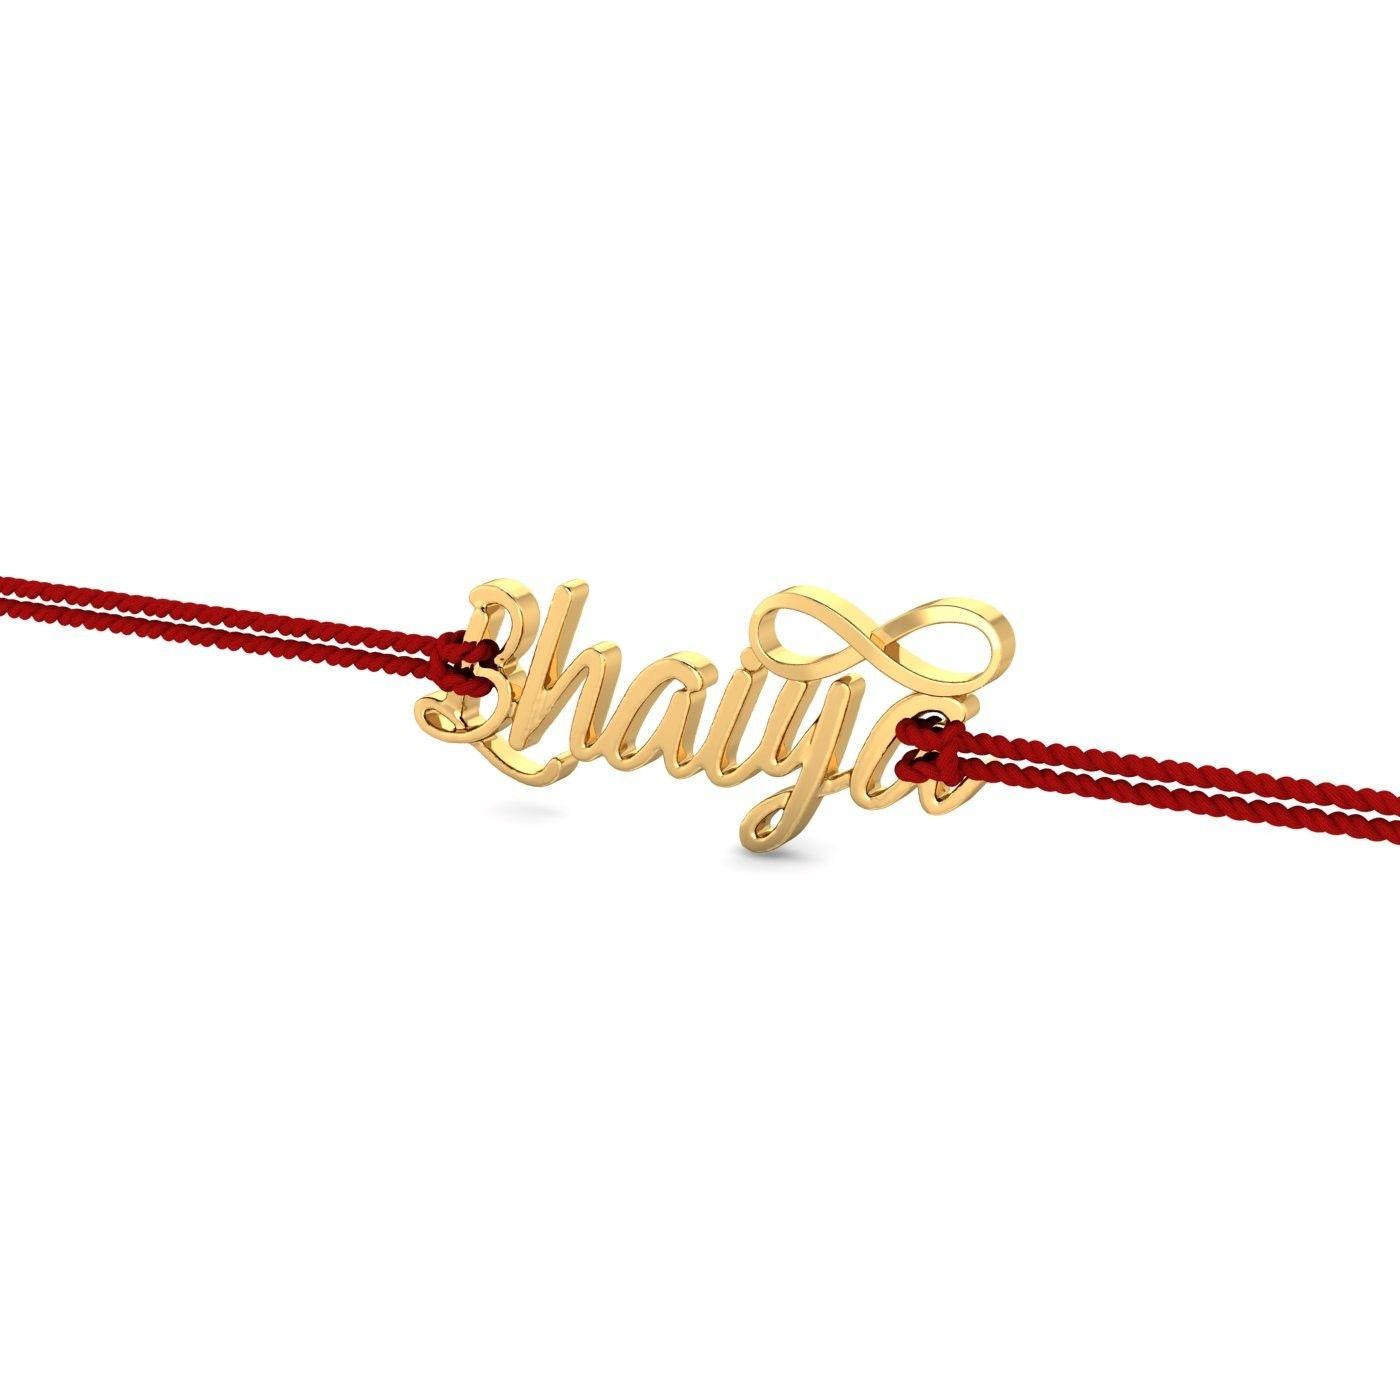 symbol design charm silver itm jewellery infinity sterling love women bracelet